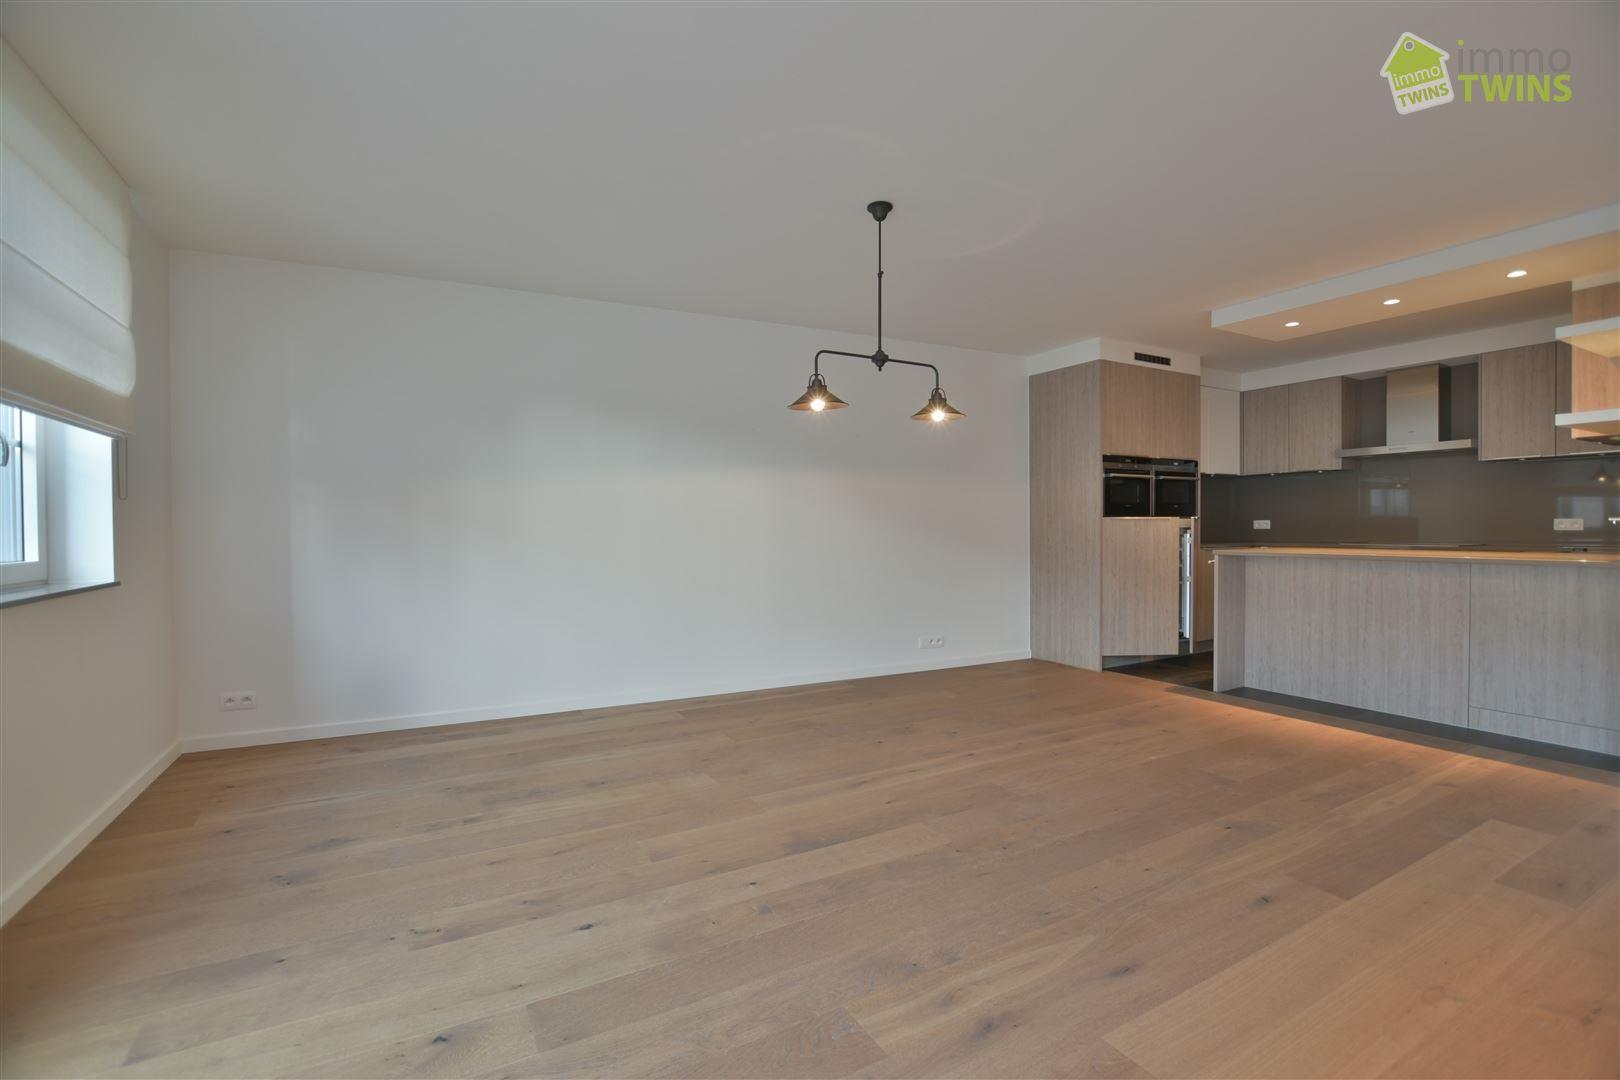 Foto 3 : Appartement te 9200 DENDERMONDE (België) - Prijs € 1.100